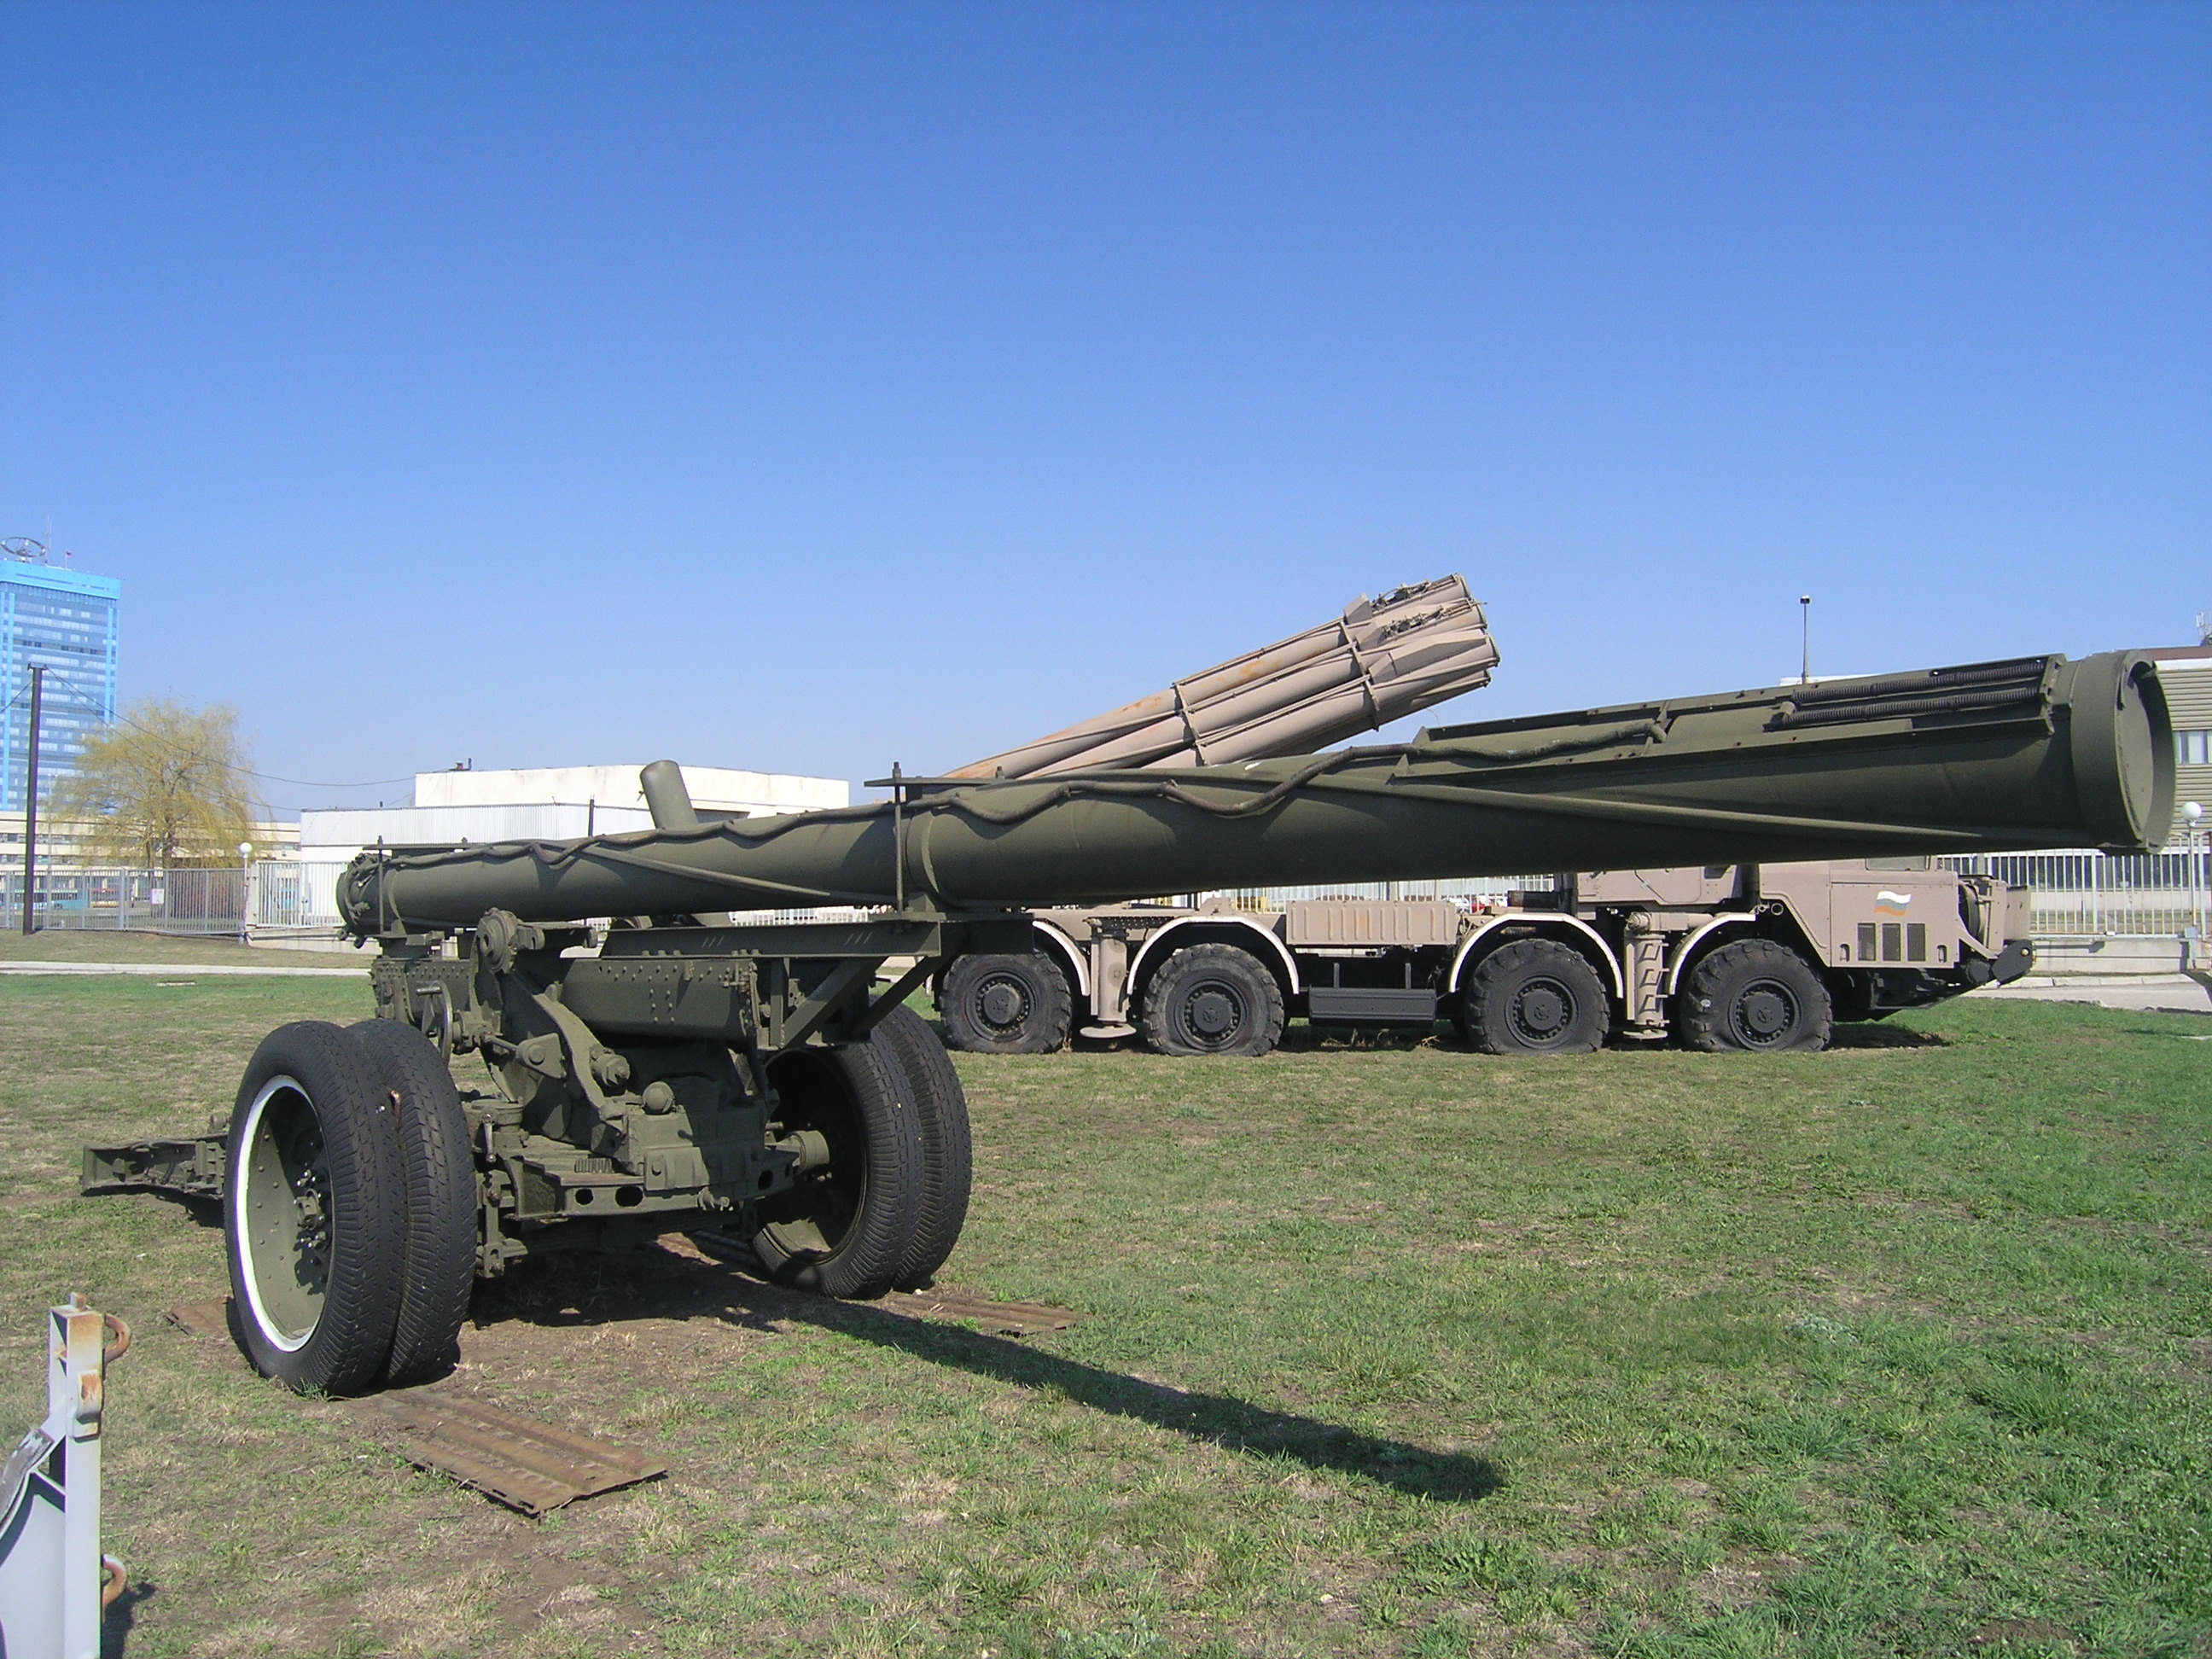 Experimental_300-mm_rocket_launcher-5190